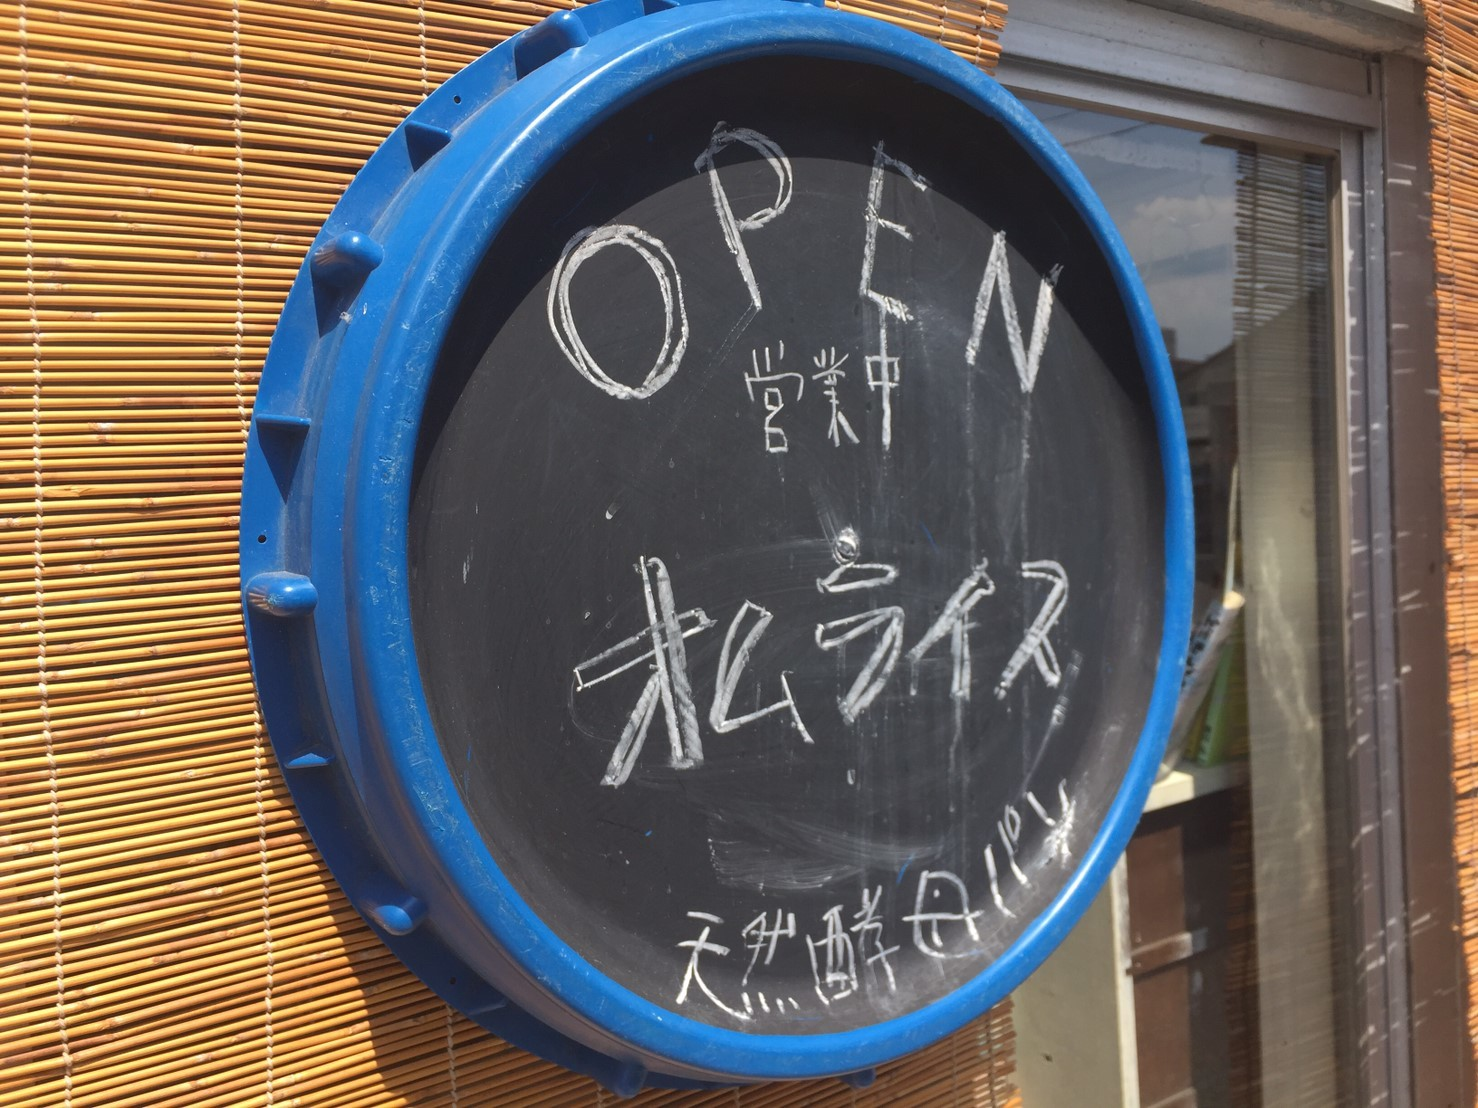 Tottori カルマ  カルマ焼飯_e0115904_15445619.jpg